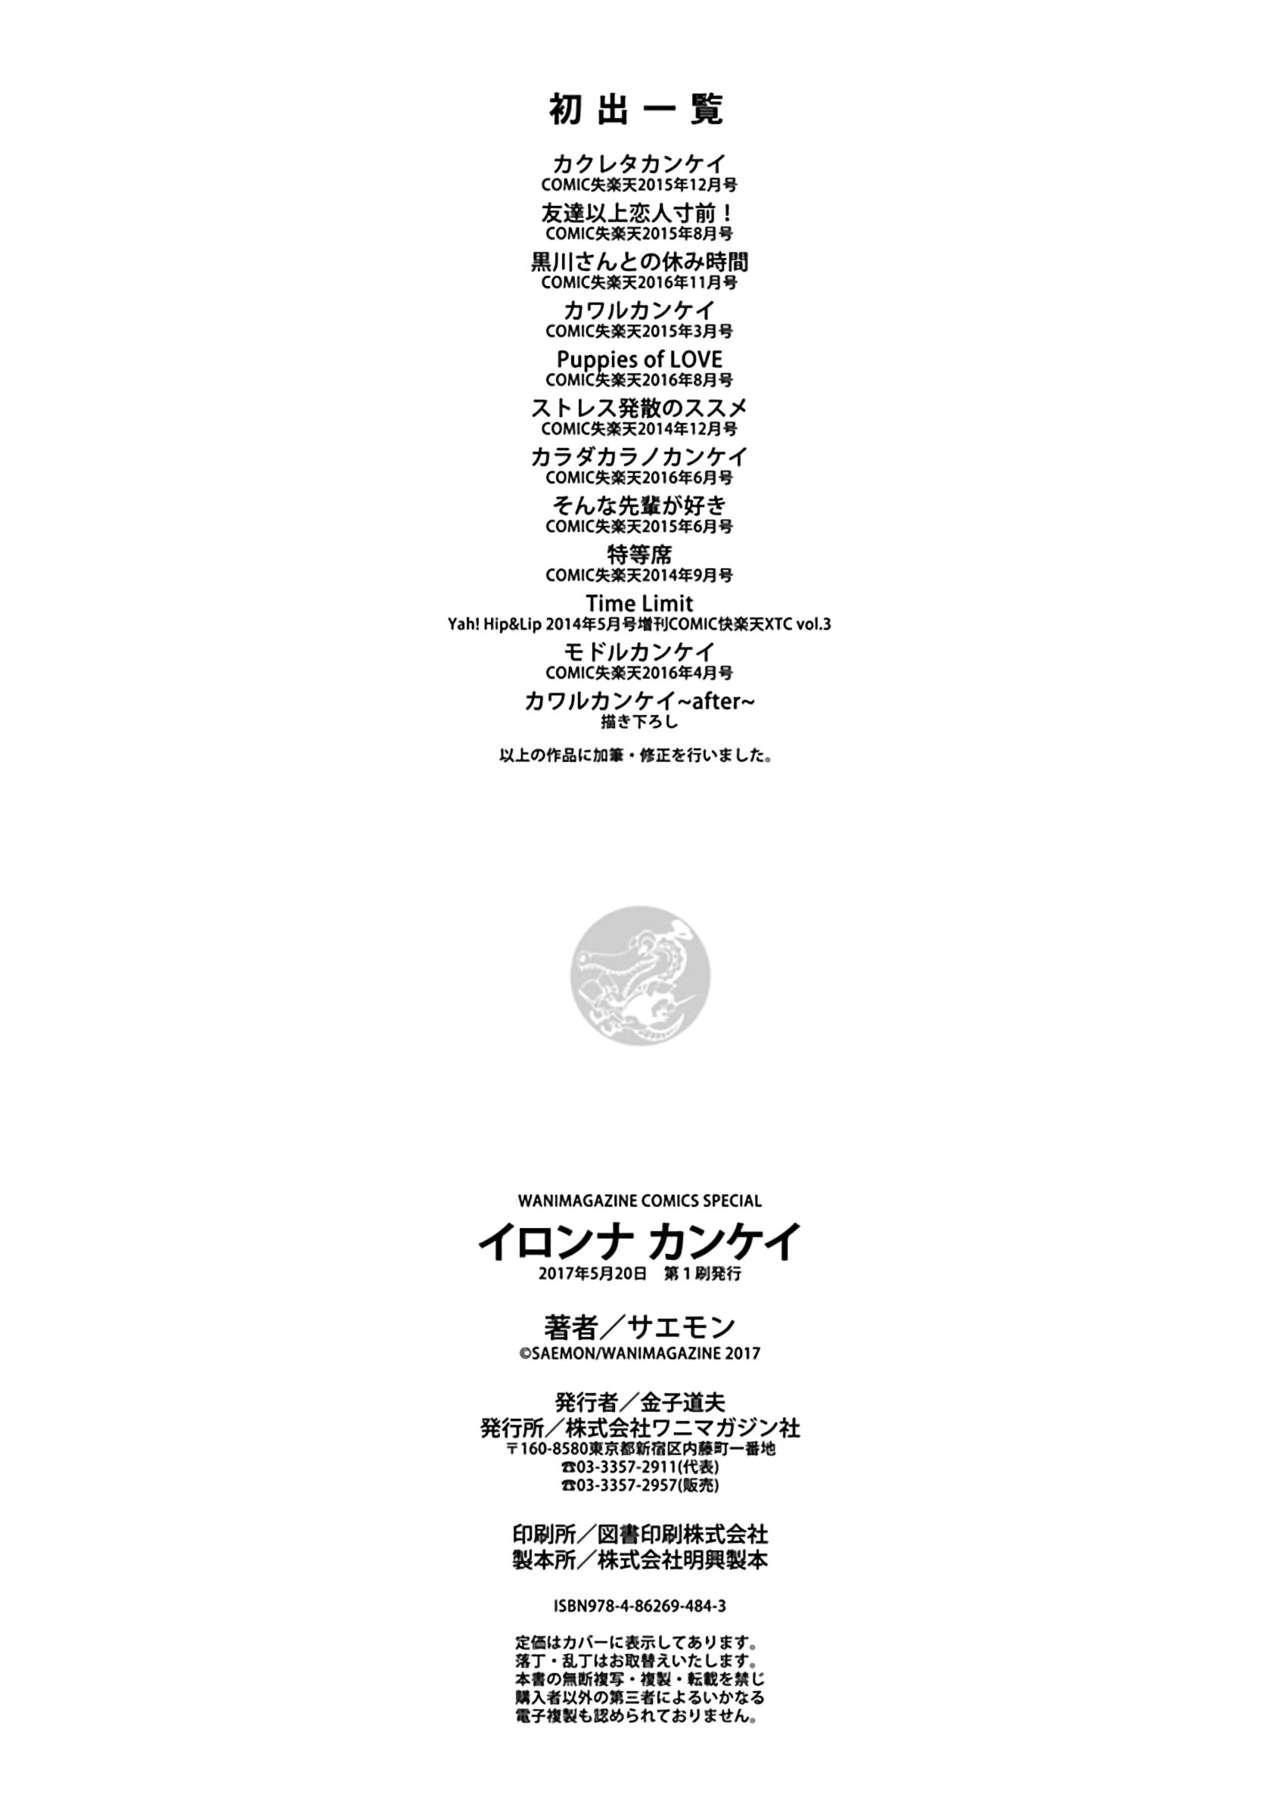 [Saemon] Ironna Kankei - Iro-Ero relationship Ch. 1-2, 4, 6, 8, 10, 12 [English] [N04h] [Digital] 117